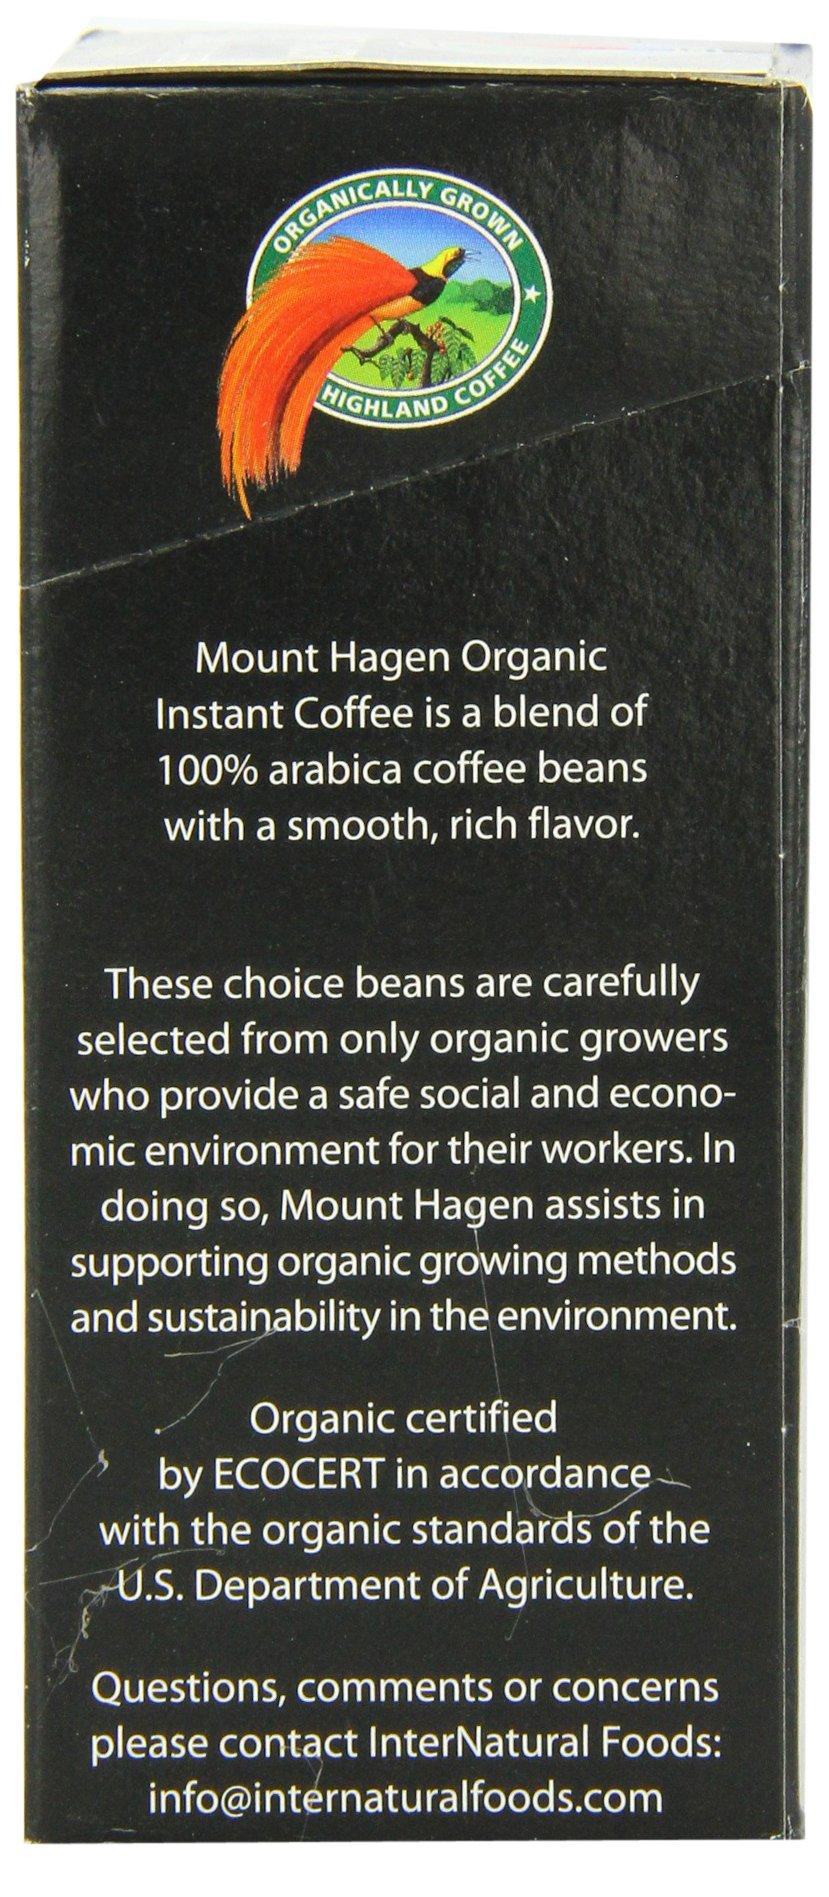 Mount Hagen Organic Instant Regular Coffee, 25-Count Single Serve packets (Pack of 4) by Mount Hagen (Image #2)